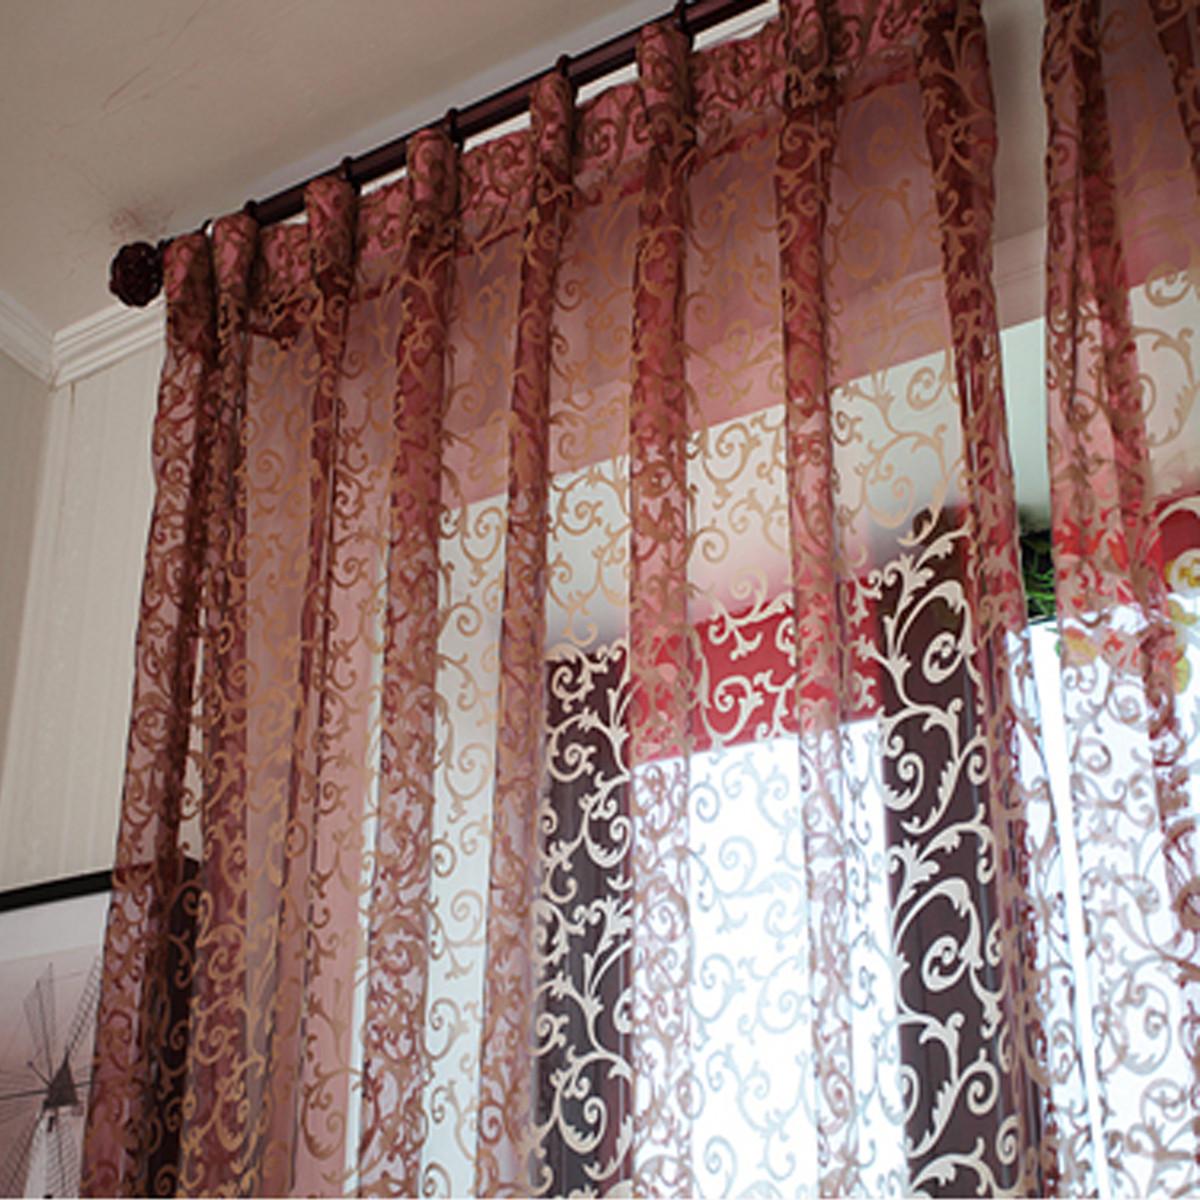 Flacado Cortina de Gasa Mosquitera Visilio Cortinilla Quitar Mosquitos Curtain